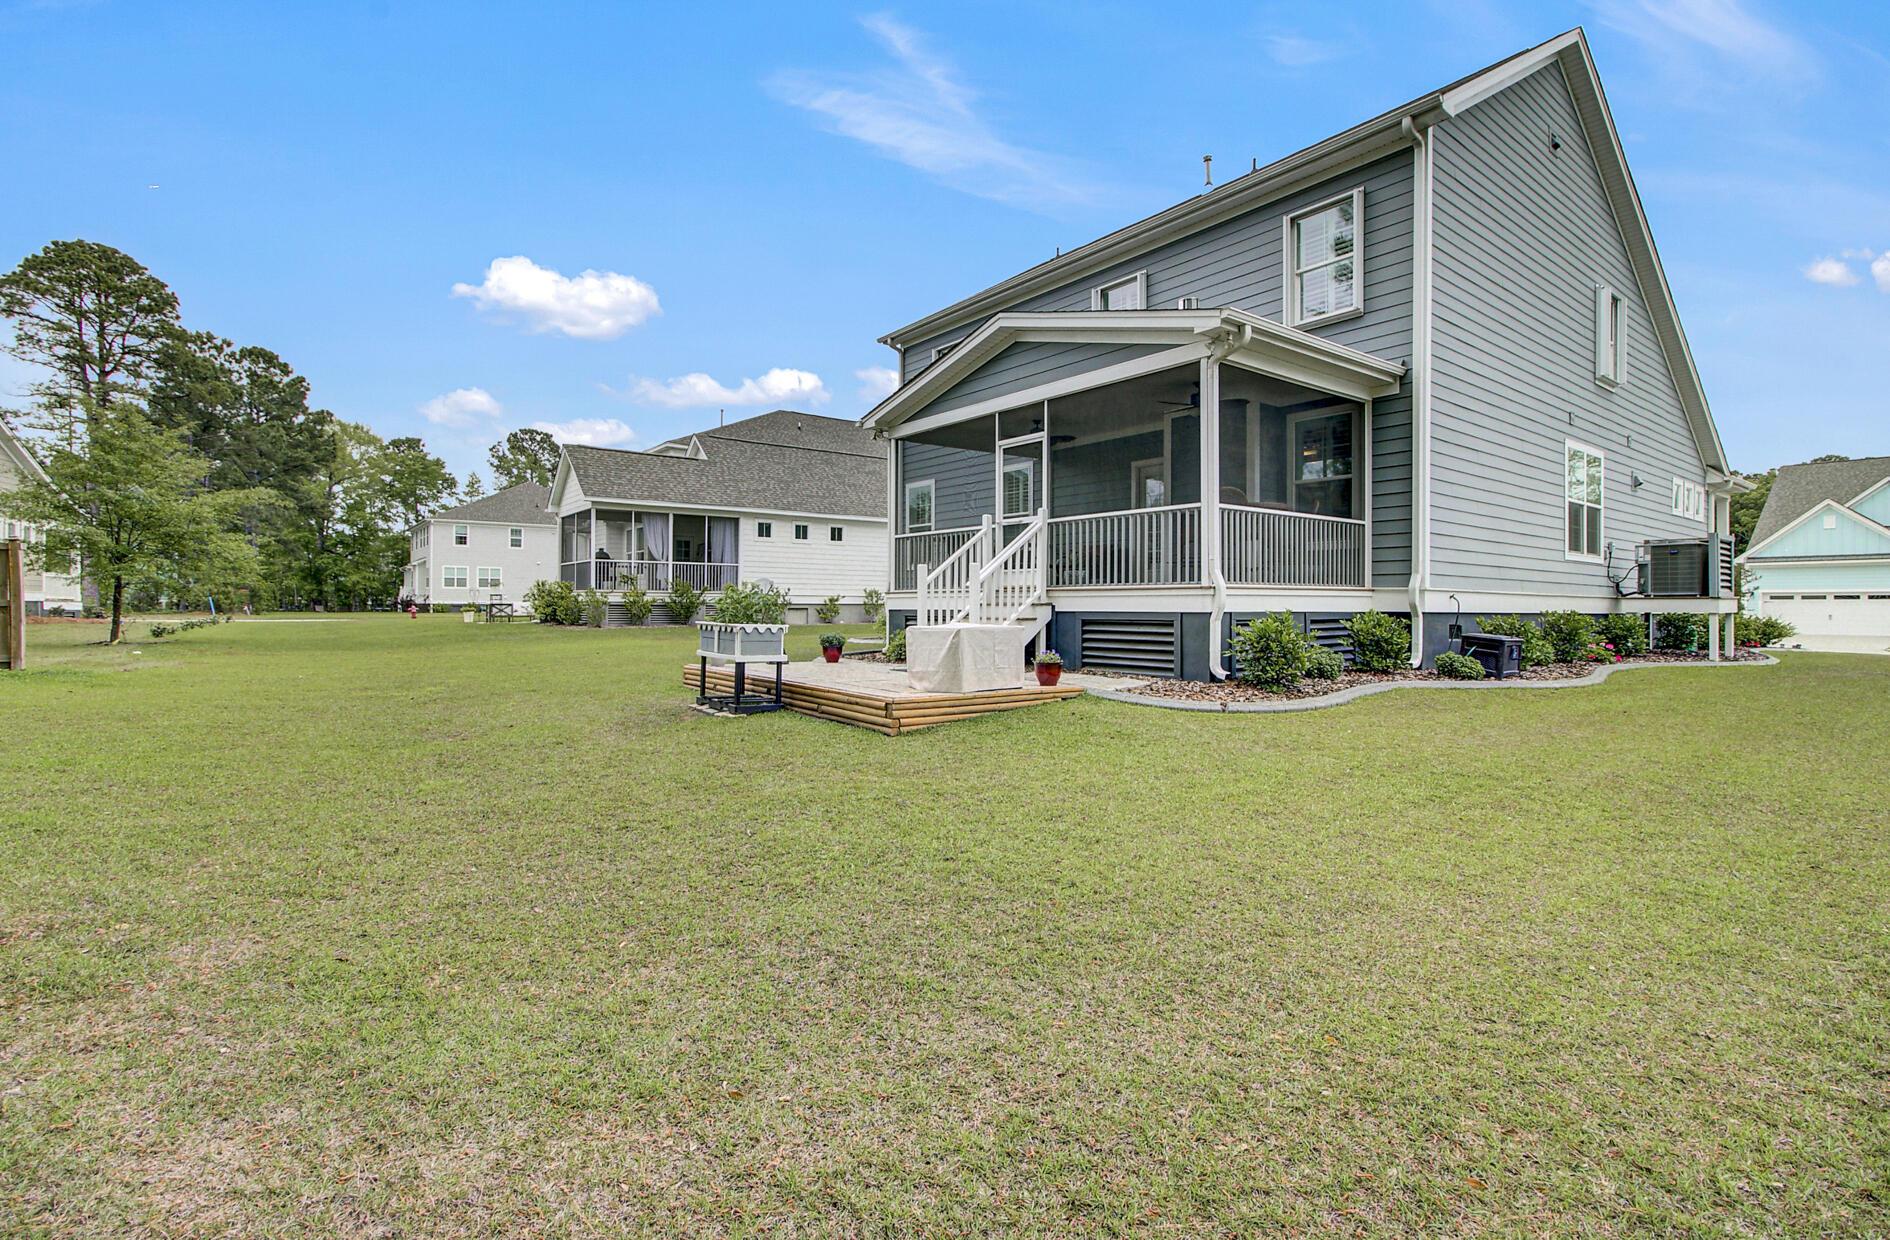 Park West Homes For Sale - 2824 Wagner, Mount Pleasant, SC - 20